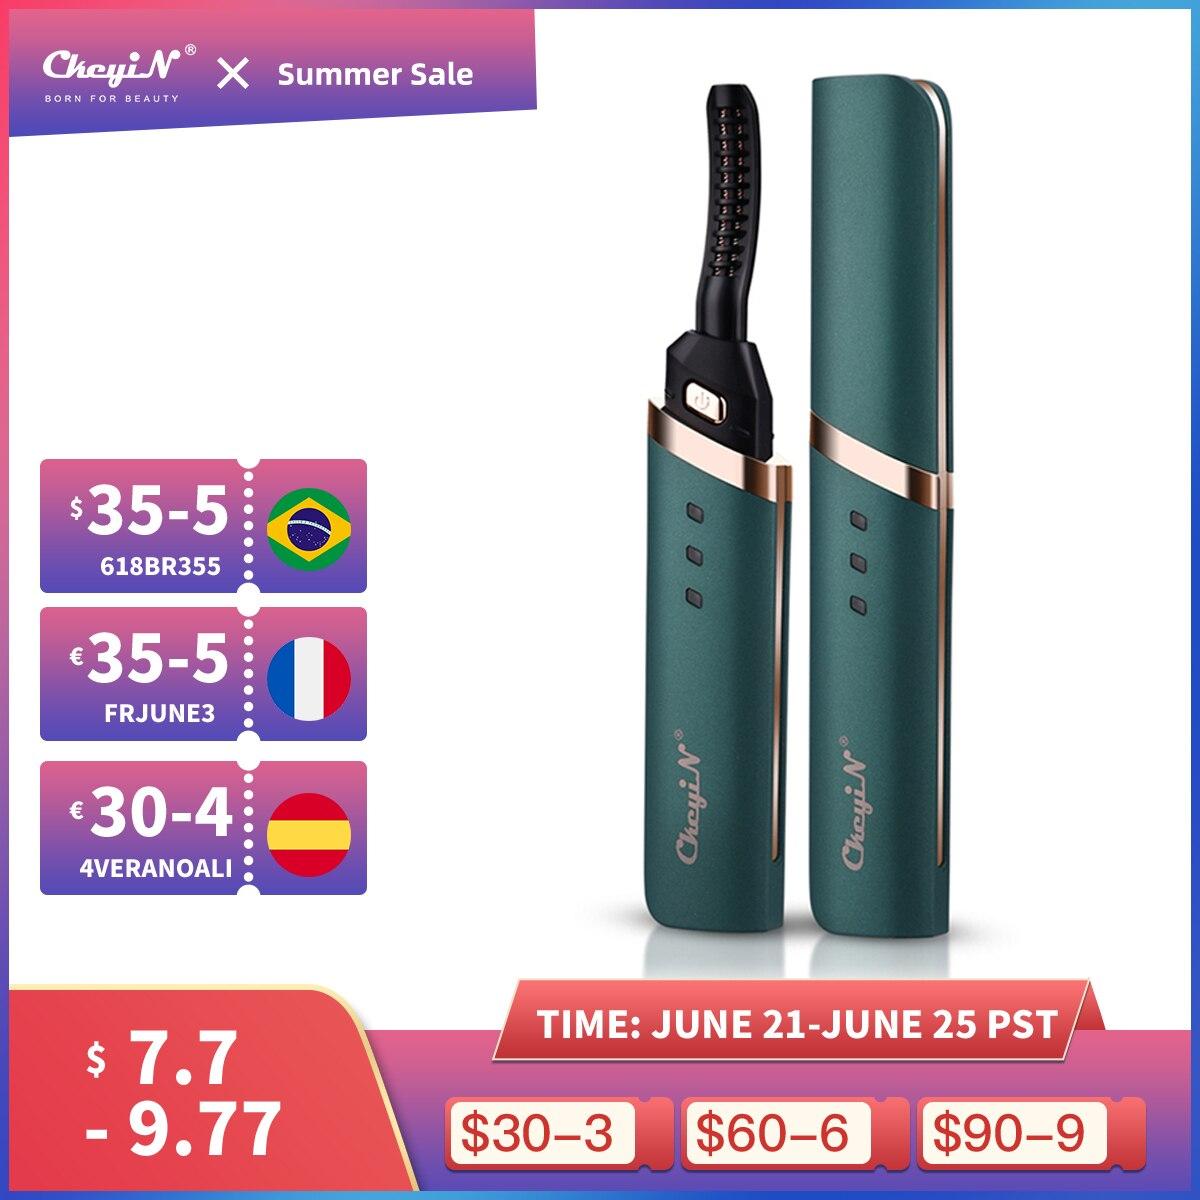 CkeyiN Electric Heated Eyelash Curler USB Rechargeable Eyelashes Curler Quick Heating Natural Eyelash Curler Long Lasting Makeup